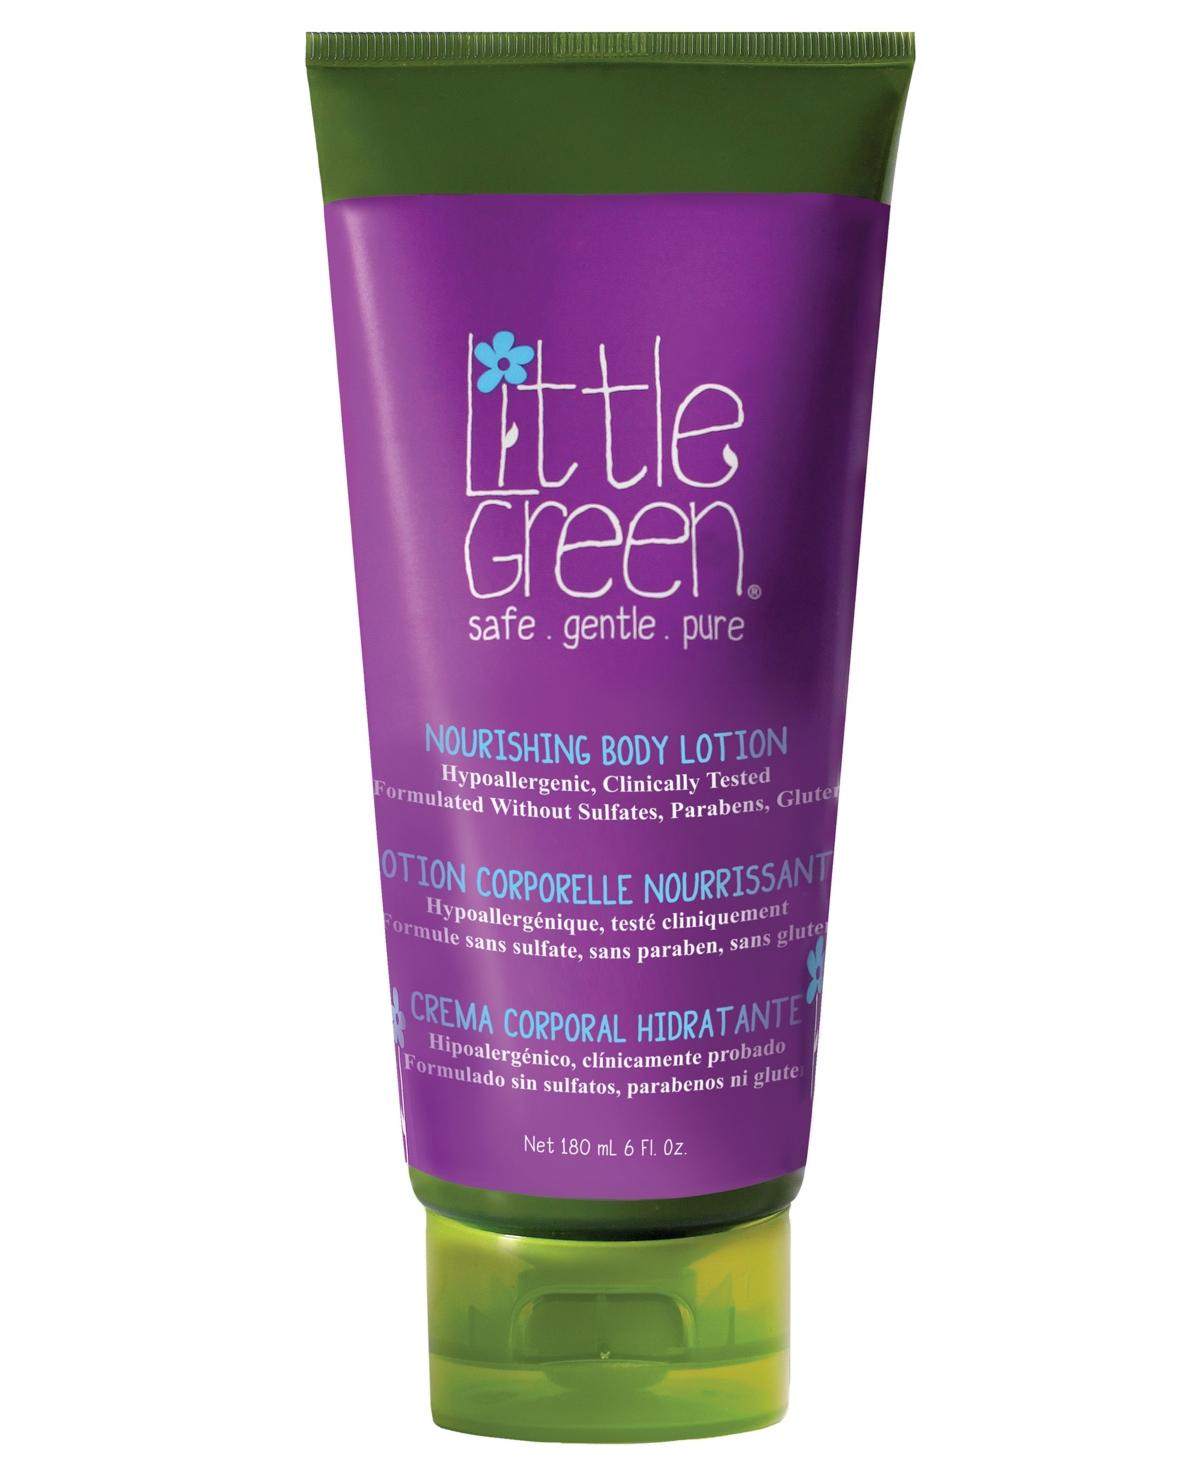 Little Green Kids Nourishing Body Lotion, 6 oz